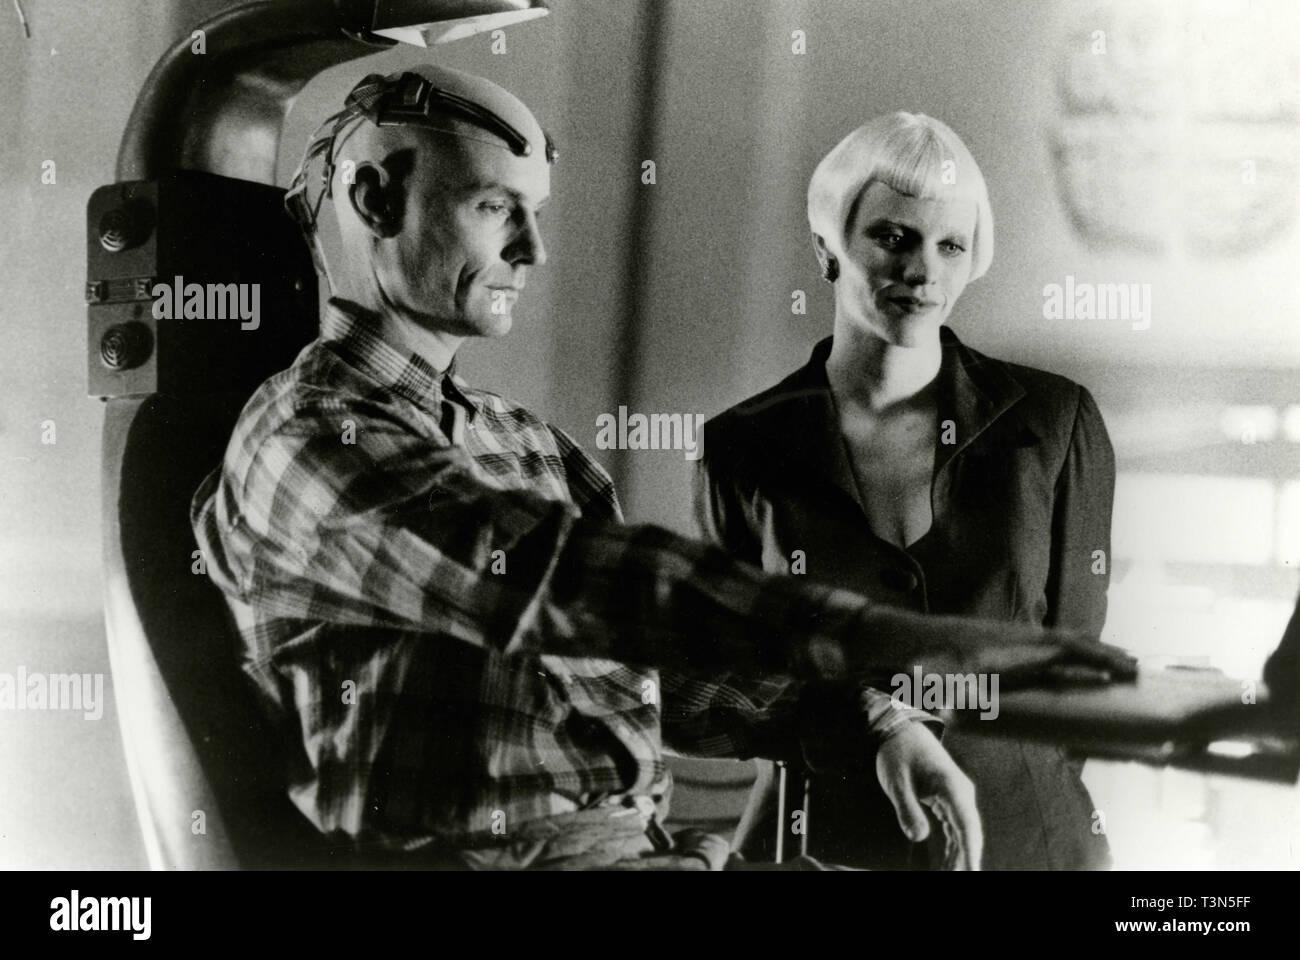 Matt Frewer in the movie Lawmower Man 2: Beyond Cyberspace, 1994 - Stock Image